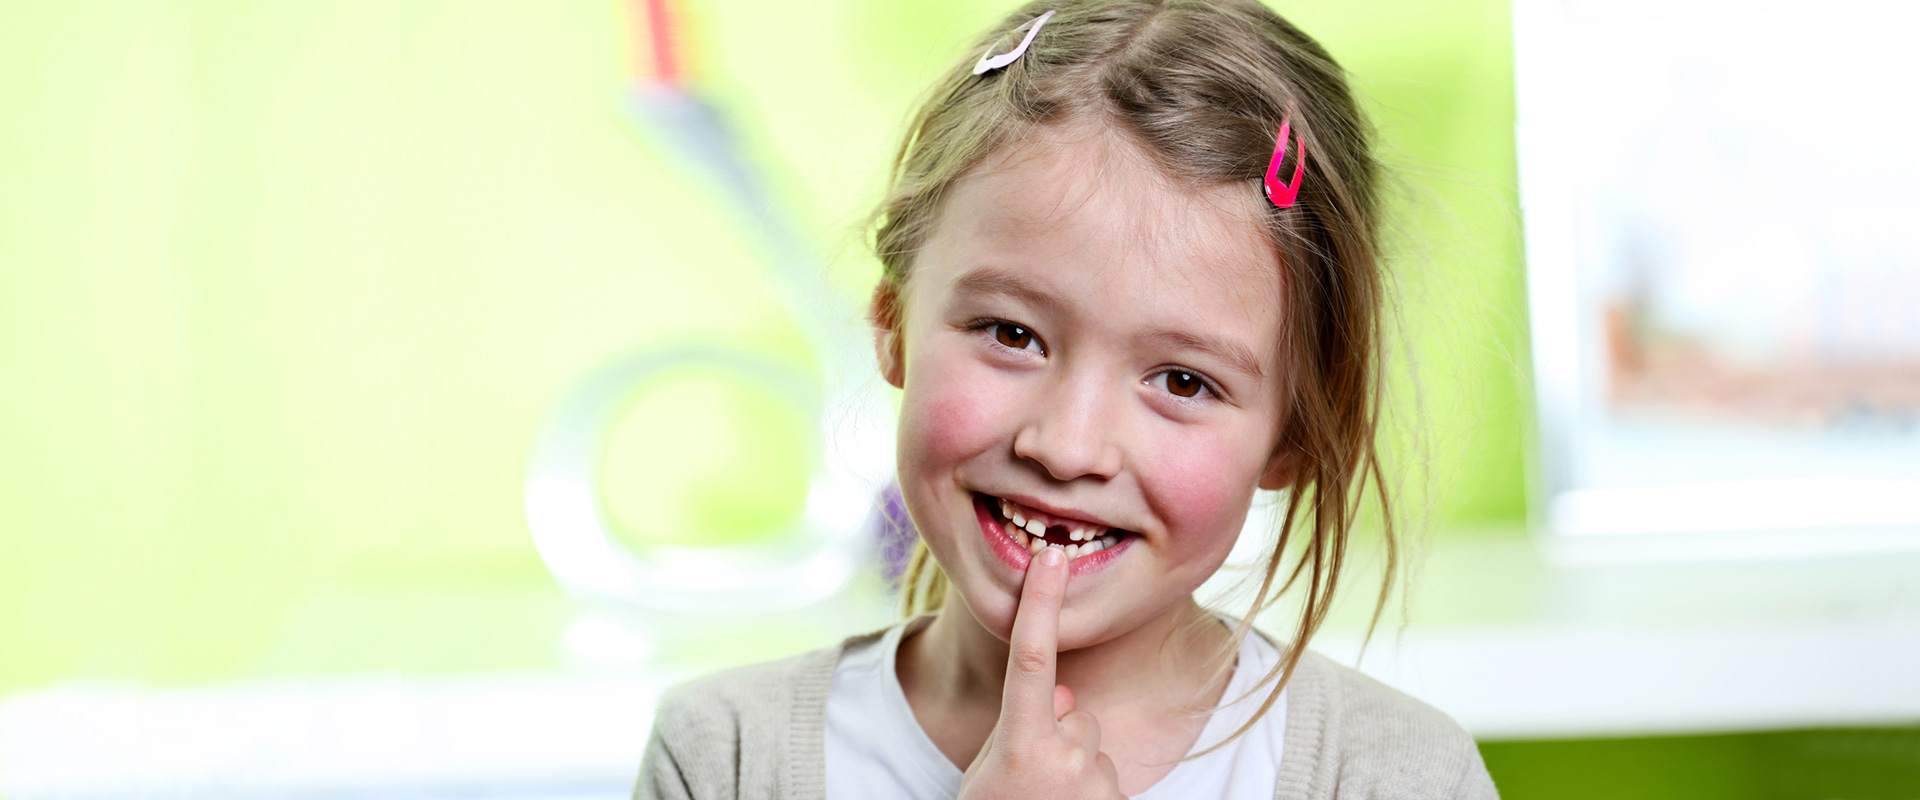 Kinderzahnheilkunde in Itzehoe